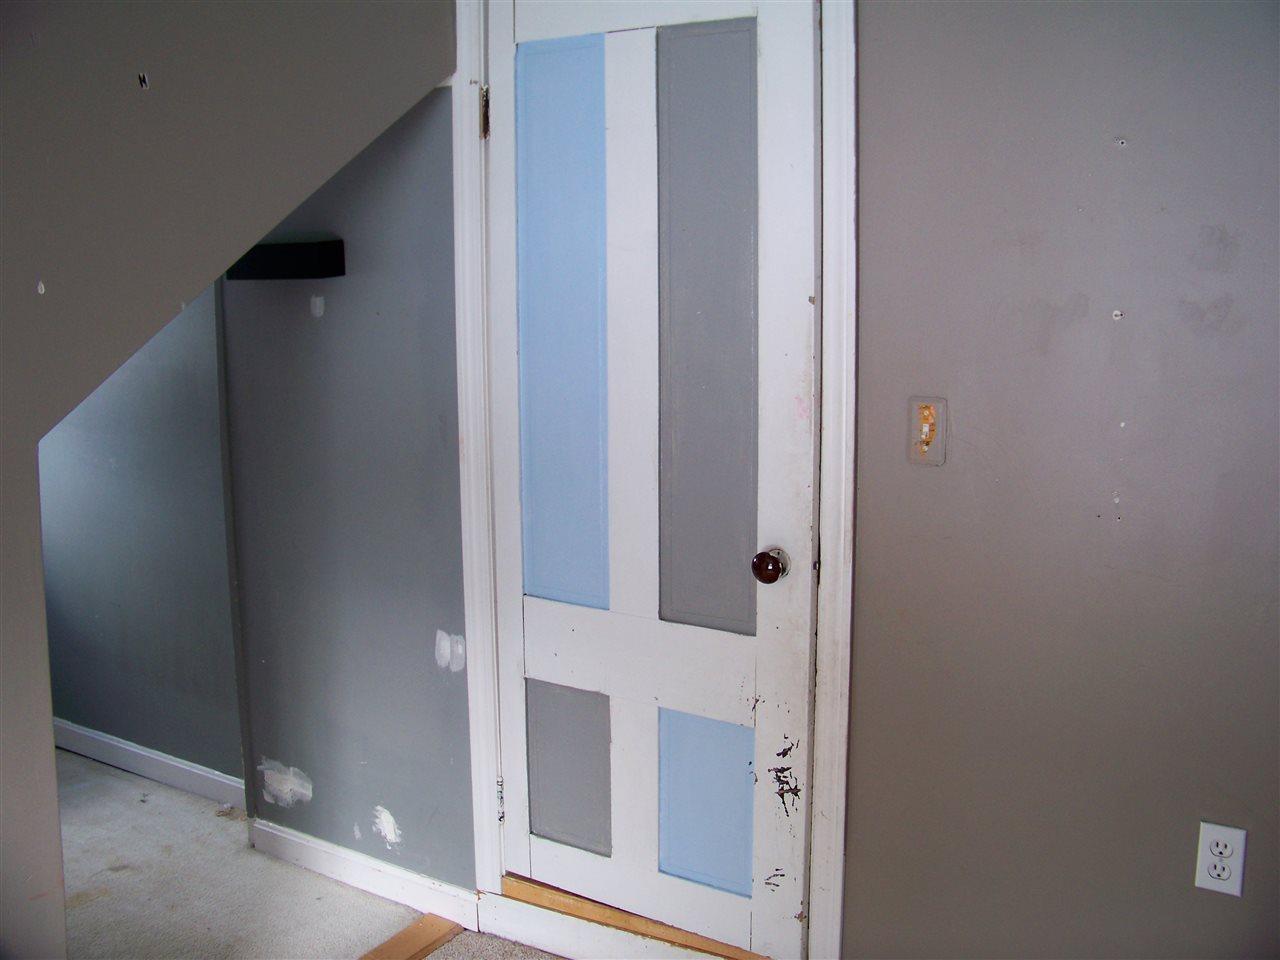 Second Floor First room